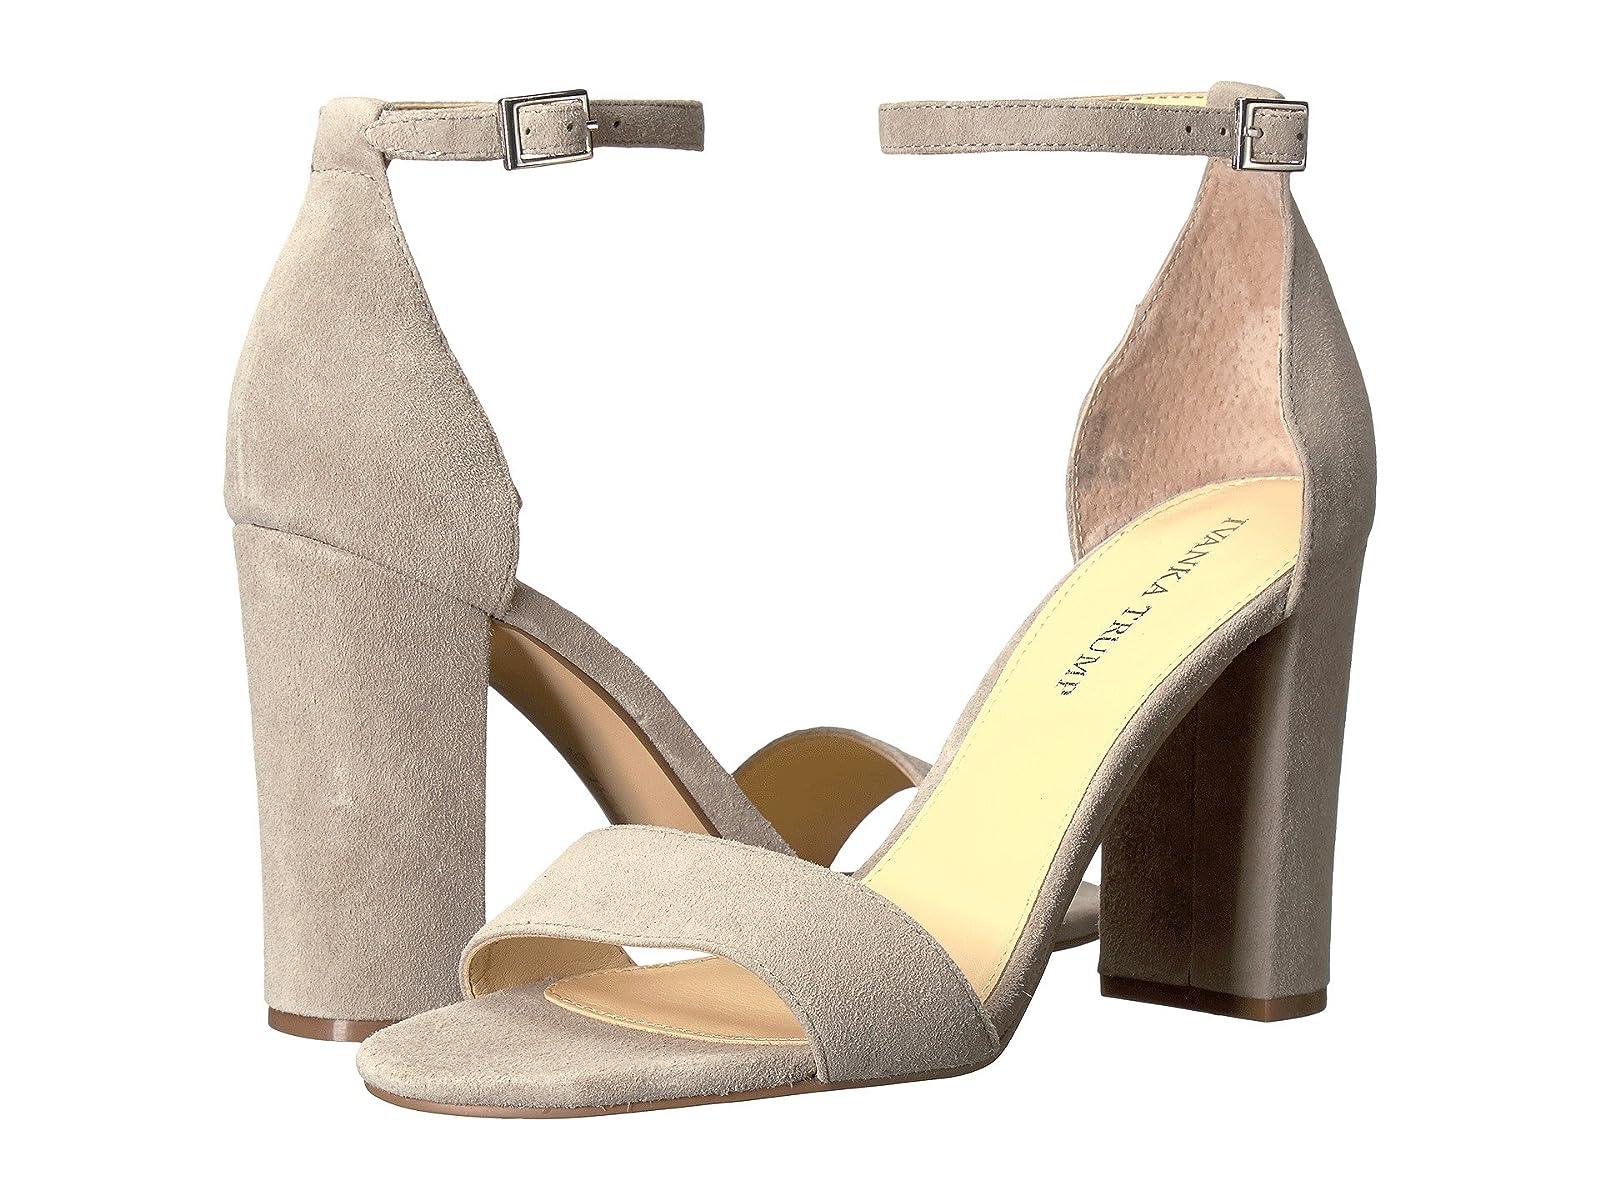 Ivanka Trump KloverCheap and distinctive eye-catching shoes